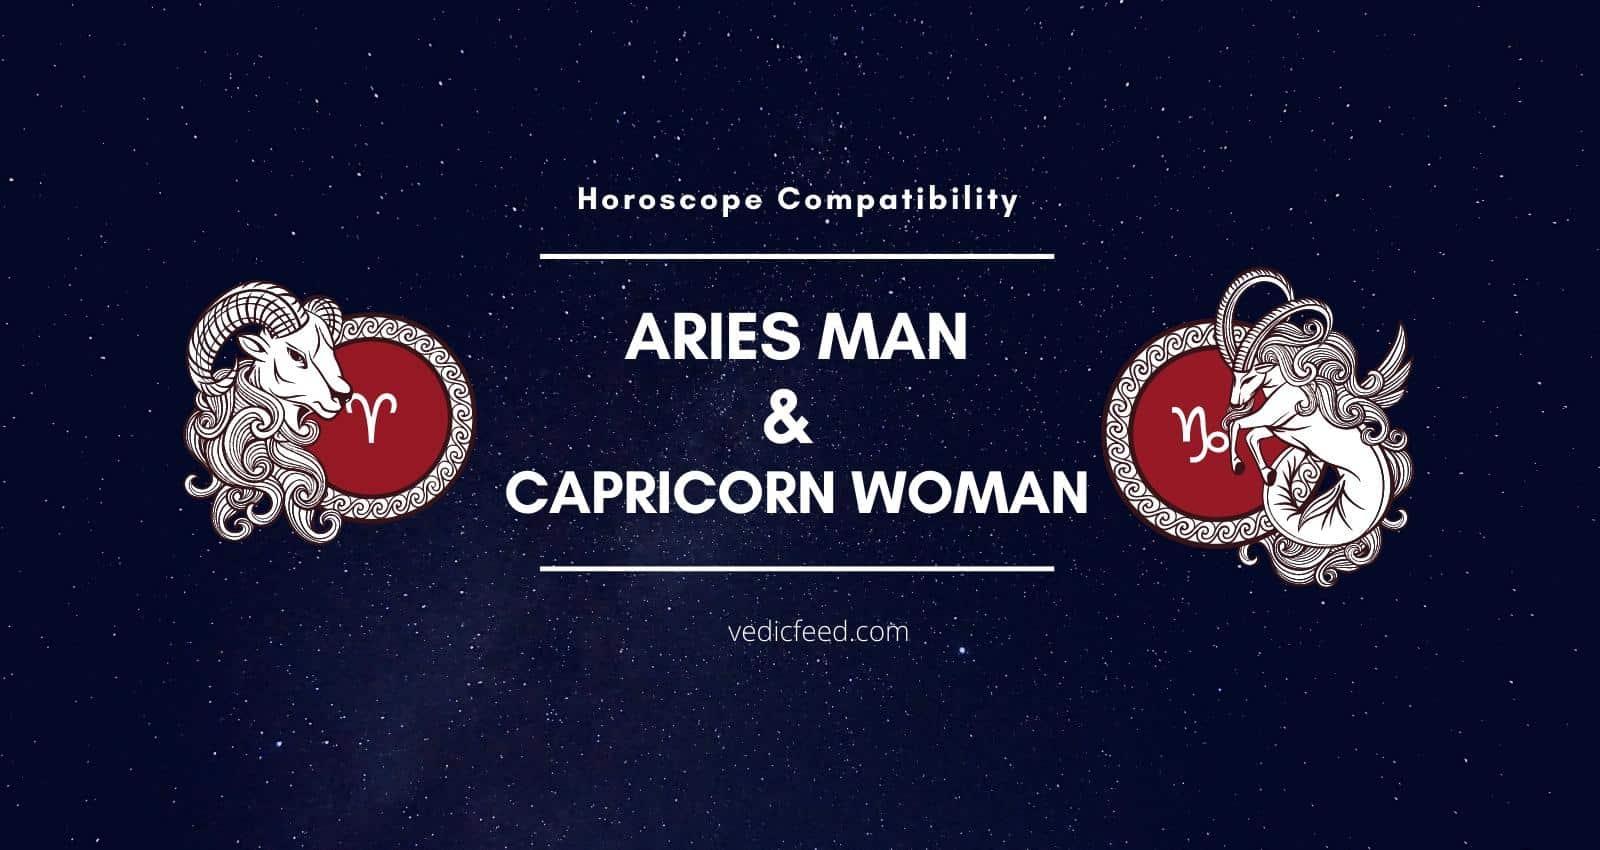 Aries Man and Capricorn Woman